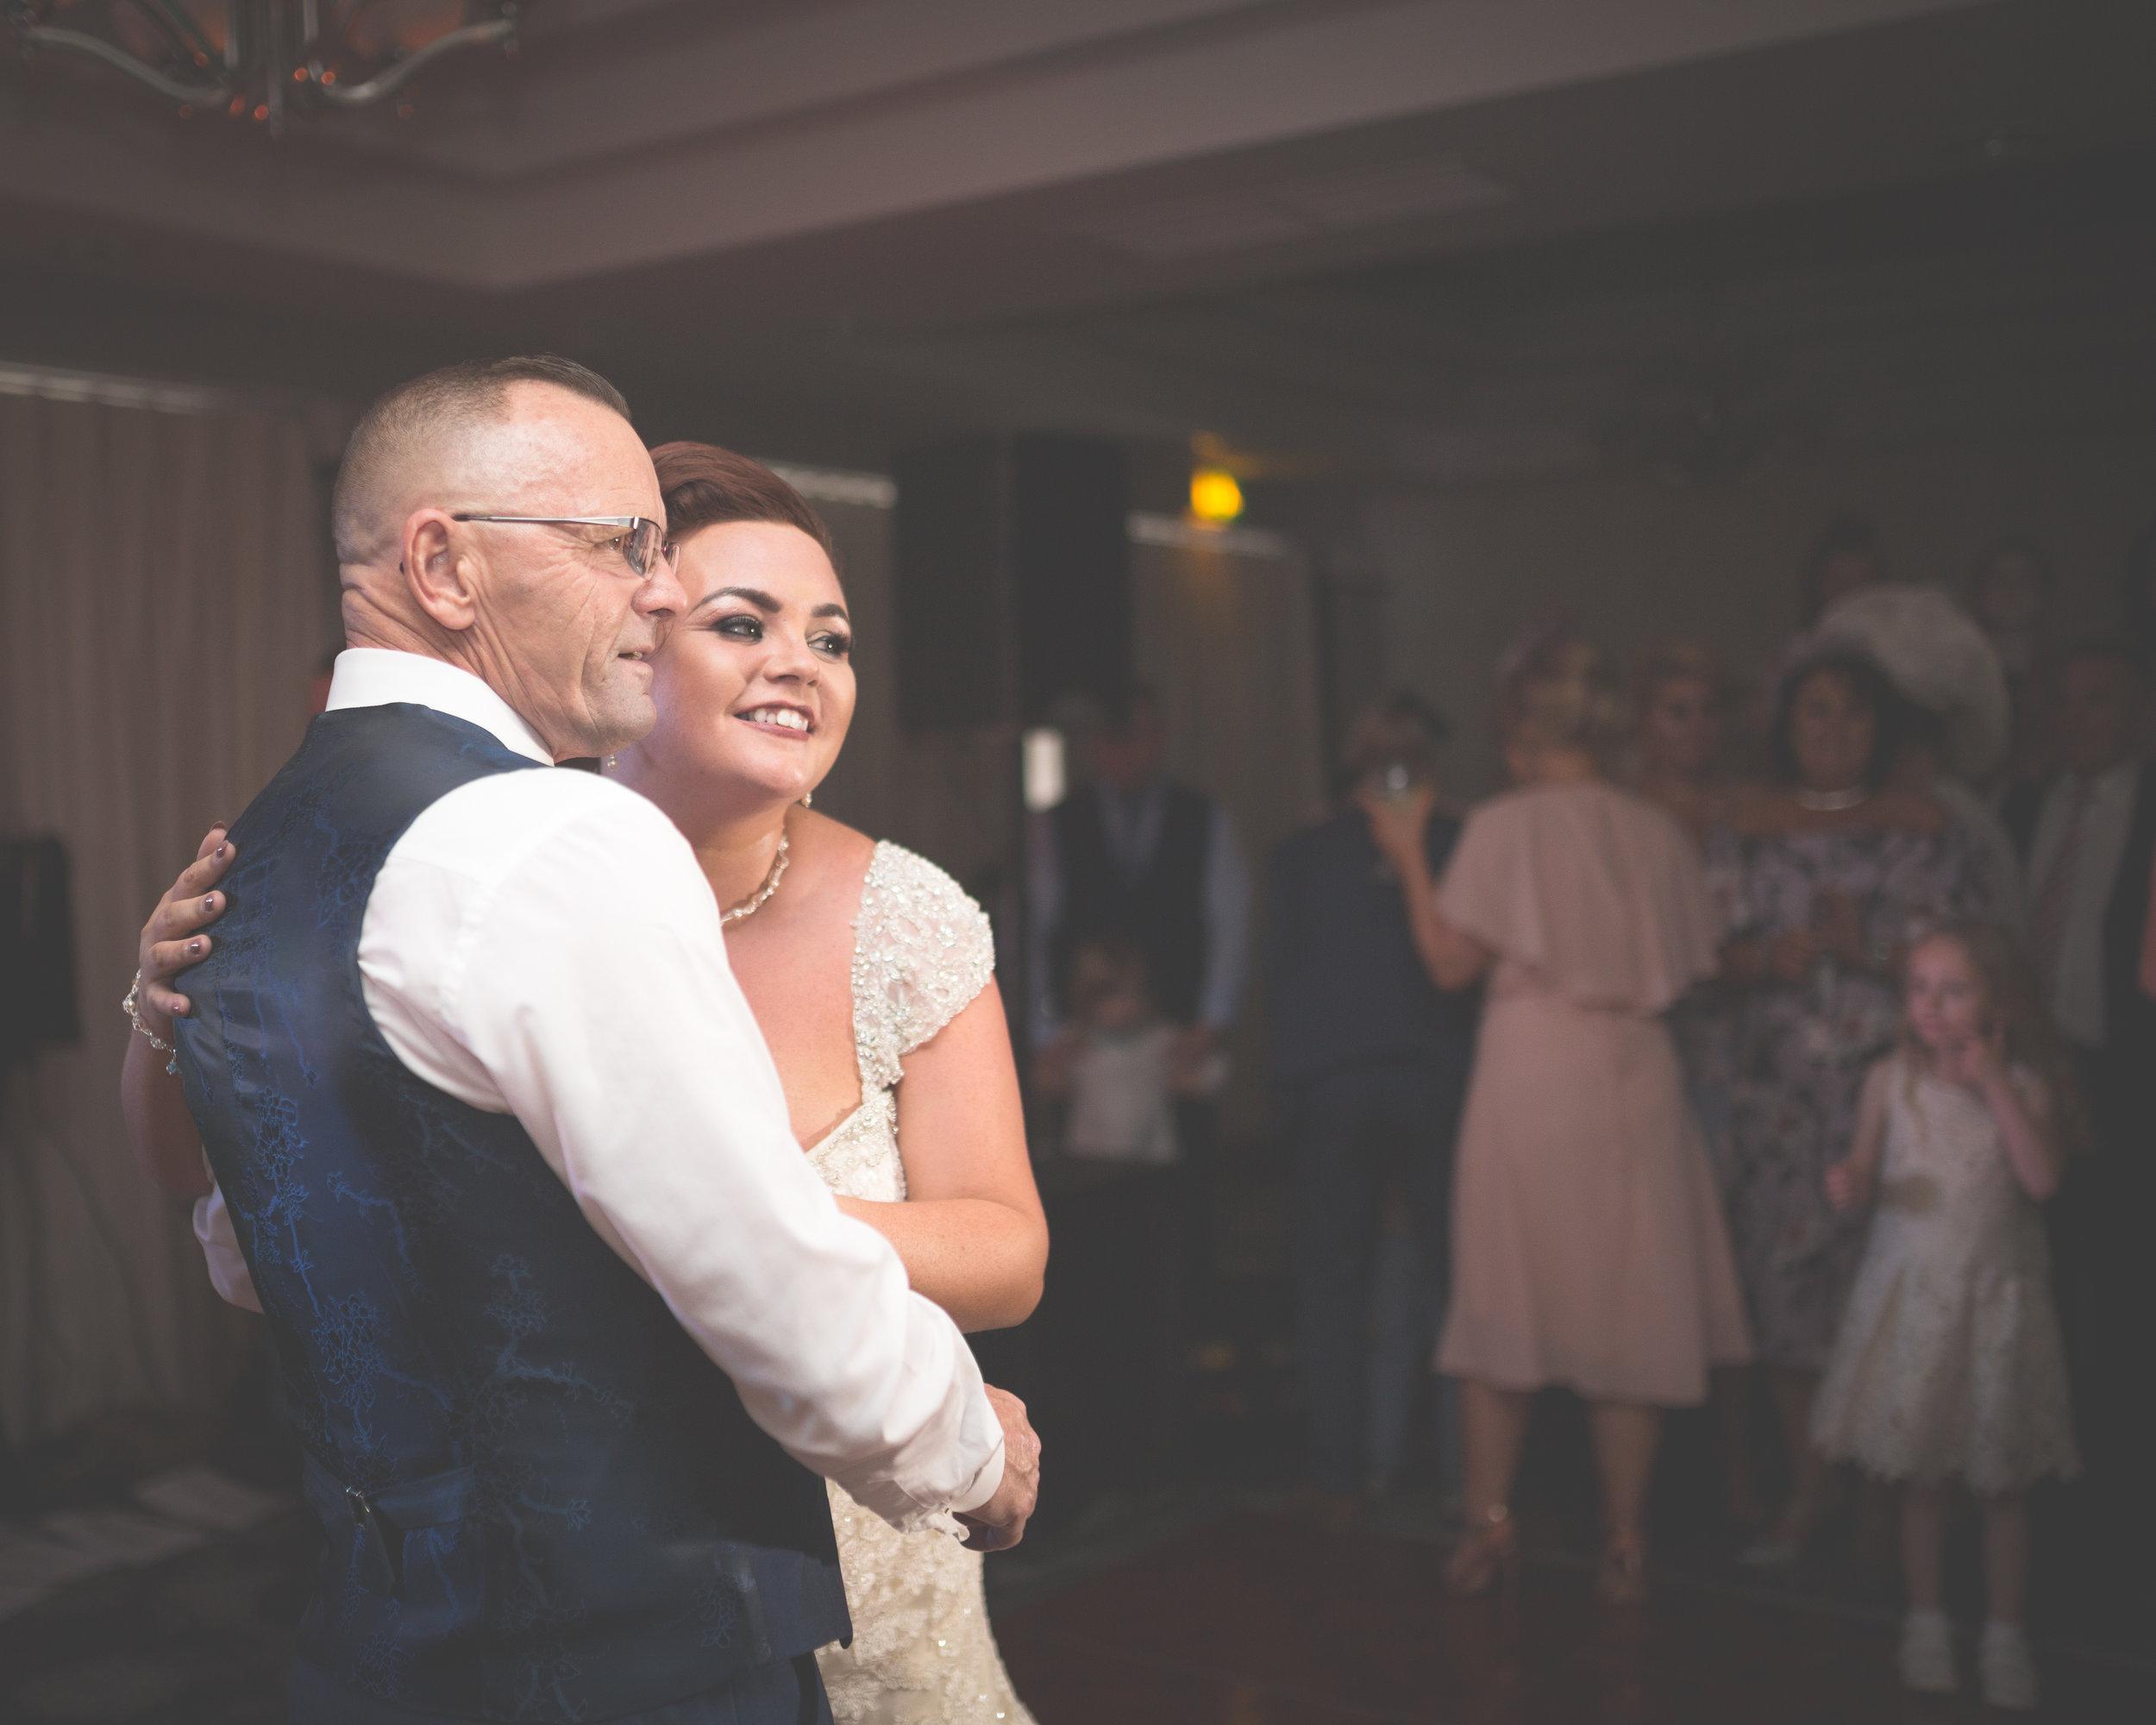 Antoinette & Stephen - First Dance | Brian McEwan Photography | Wedding Photographer Northern Ireland 35.jpg